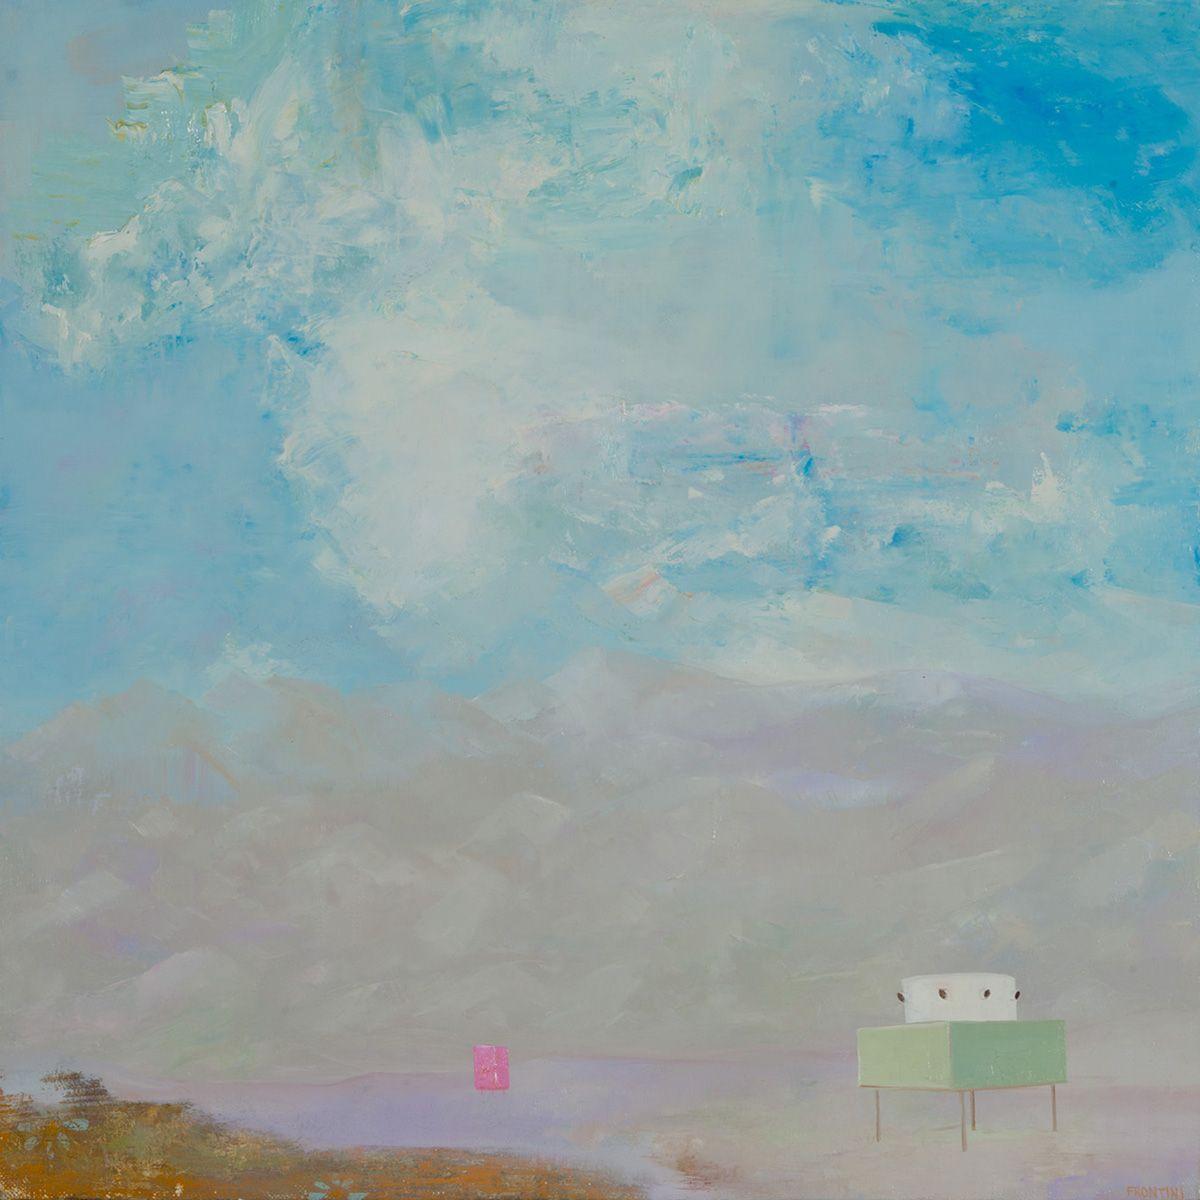 Proposal For Canvas Desert House #1 (After Albert Frey)